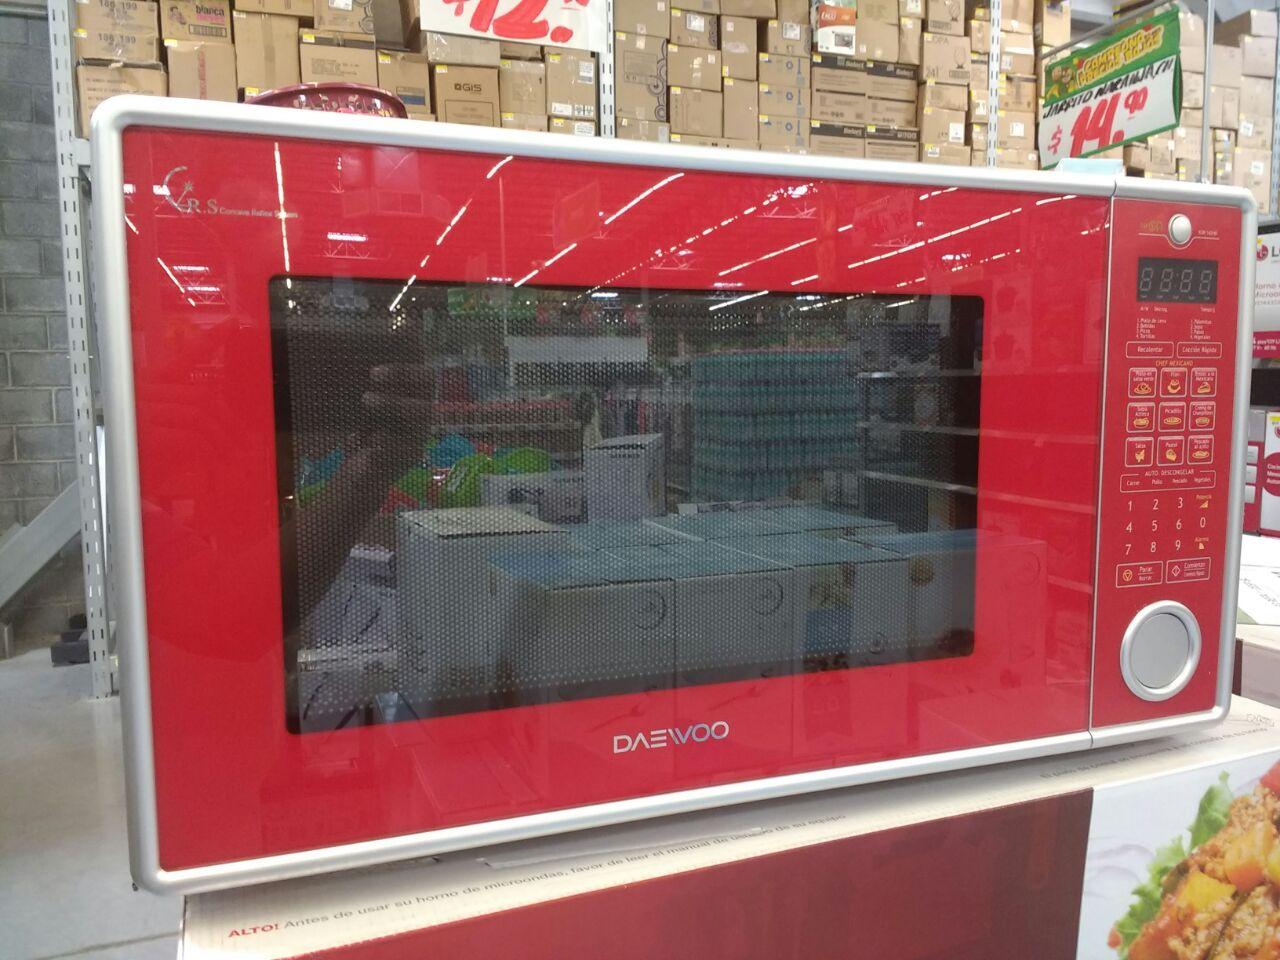 Bodega Aurrerá: Horno de microondas Daewoo Rojo a $945.01